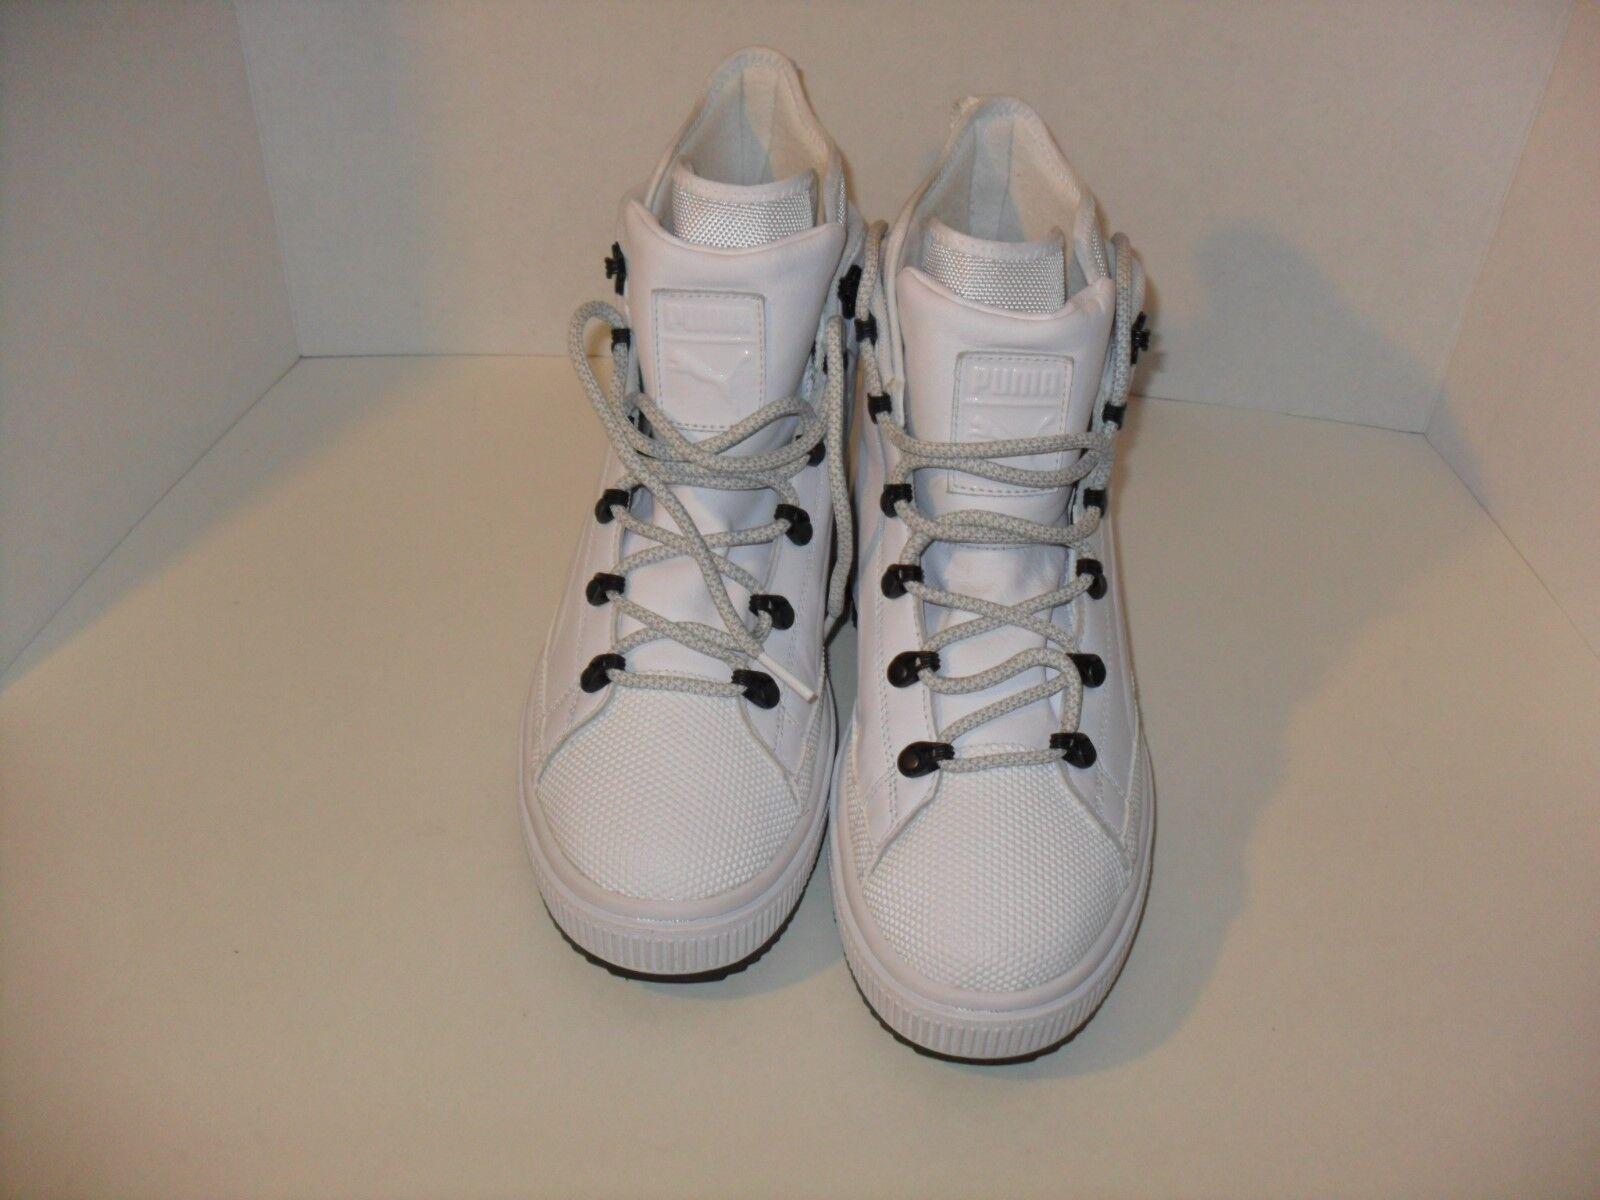 Zapato Bota De Caminar PUMA 364337 The Ren Blanco/Gum Suelas 364337 PUMA 02 tamaño 7C 44a0bc